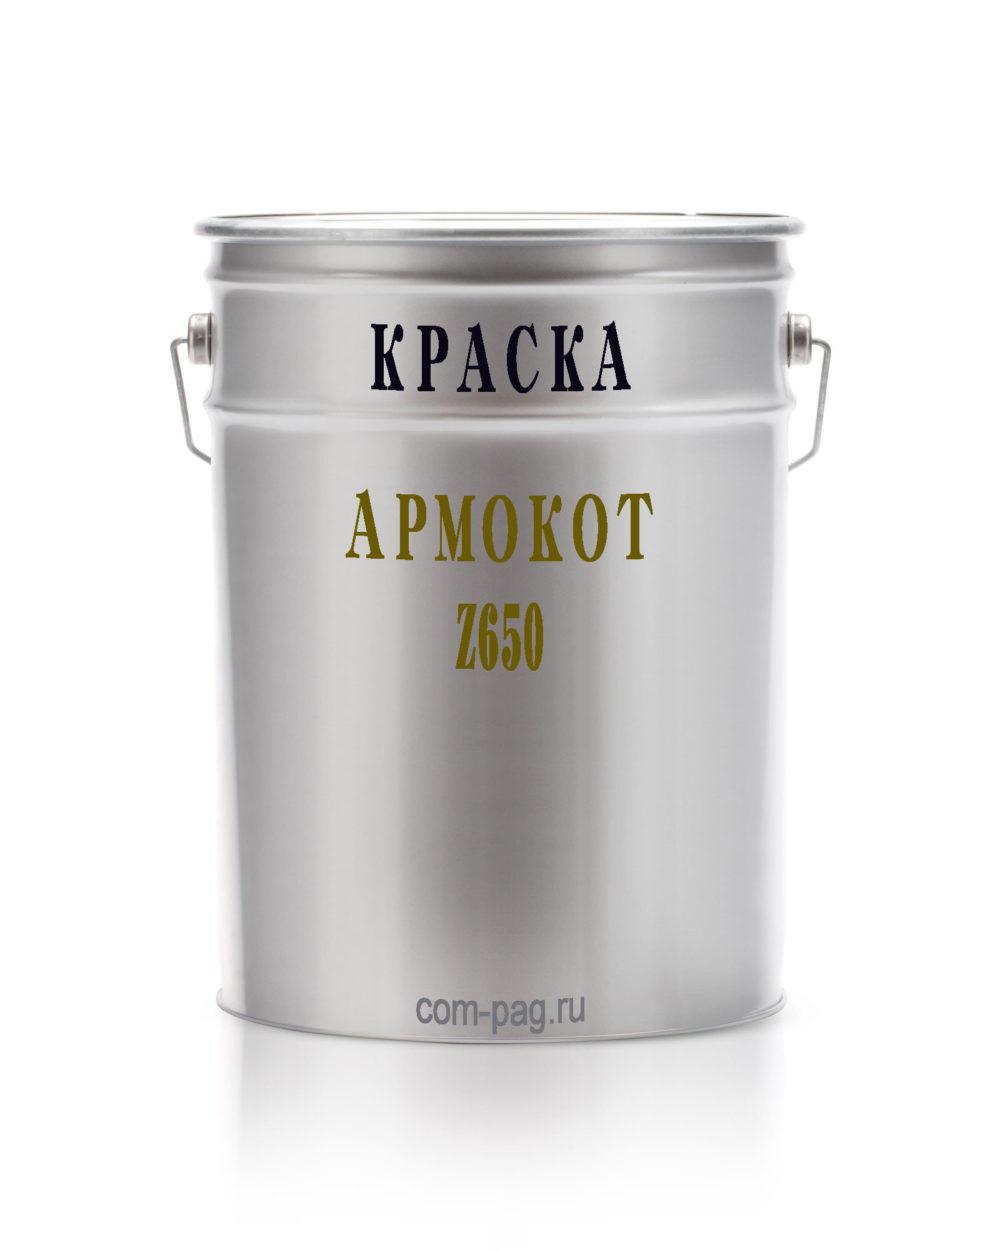 АрмокотZ650